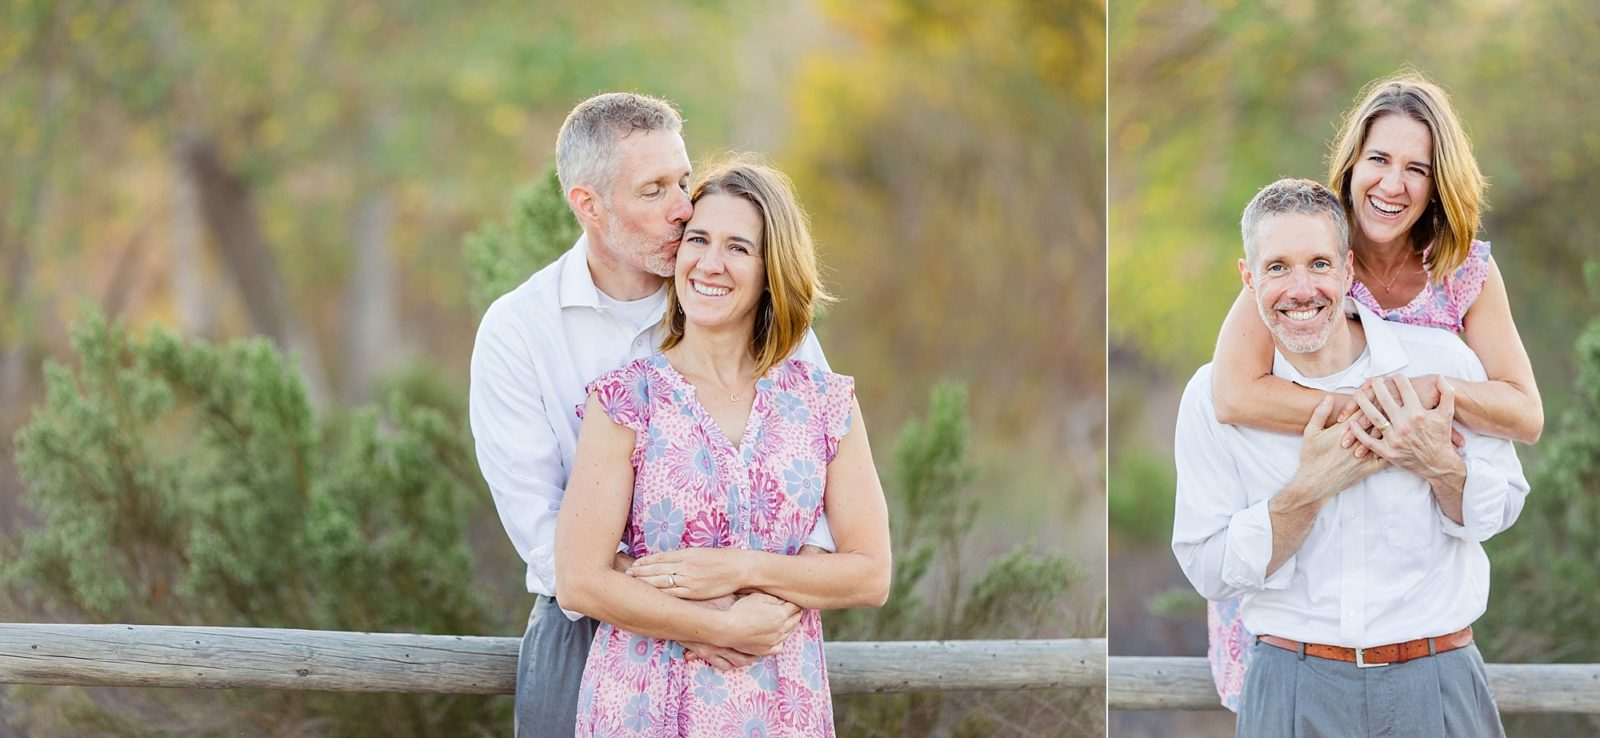 Couple Photo | San Diego Family Photography